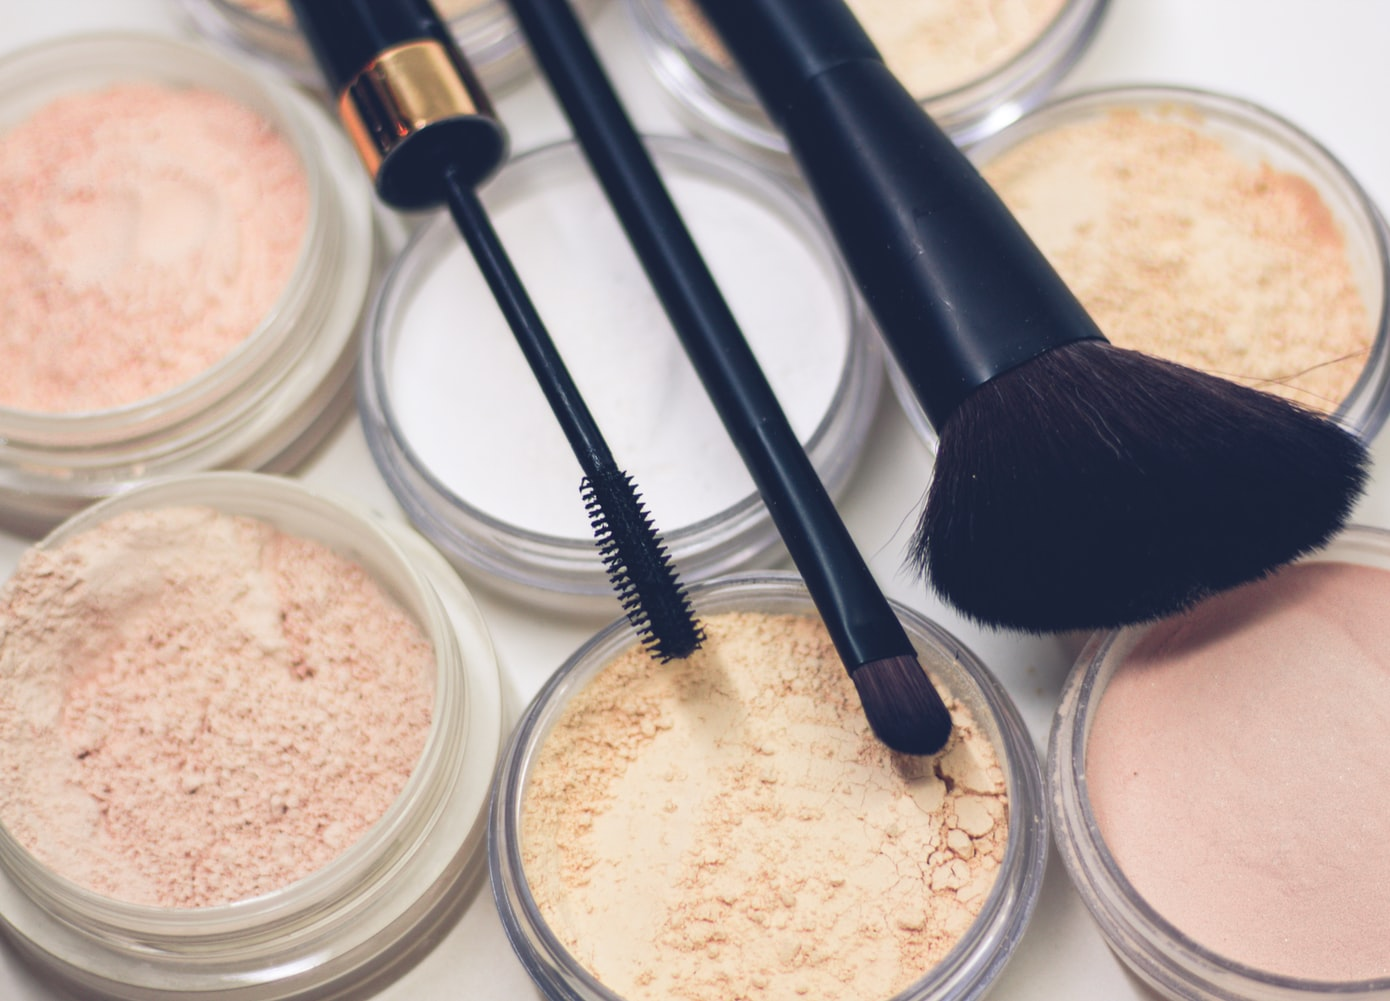 Main Differences Between Liquid & Powder Foundation